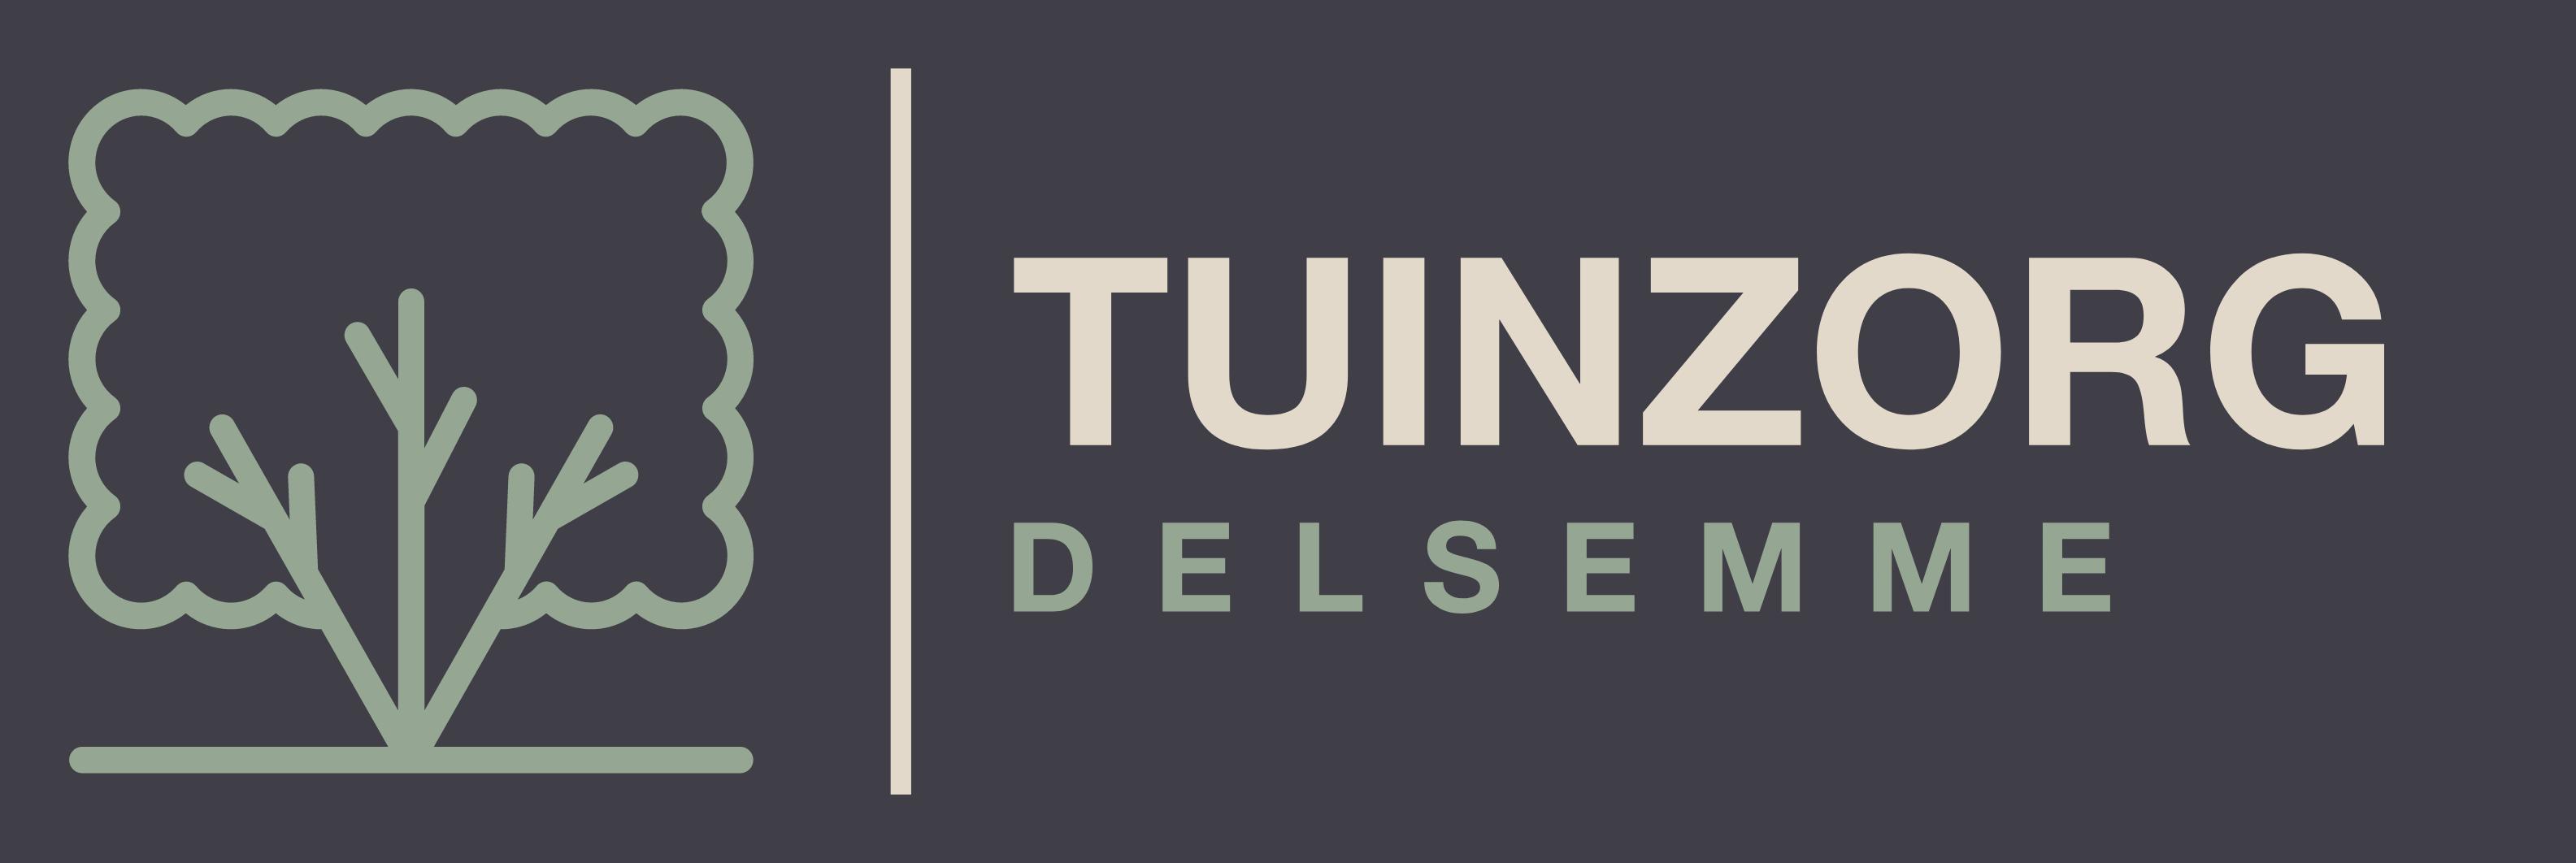 Logo Tuinzorg Delsemme